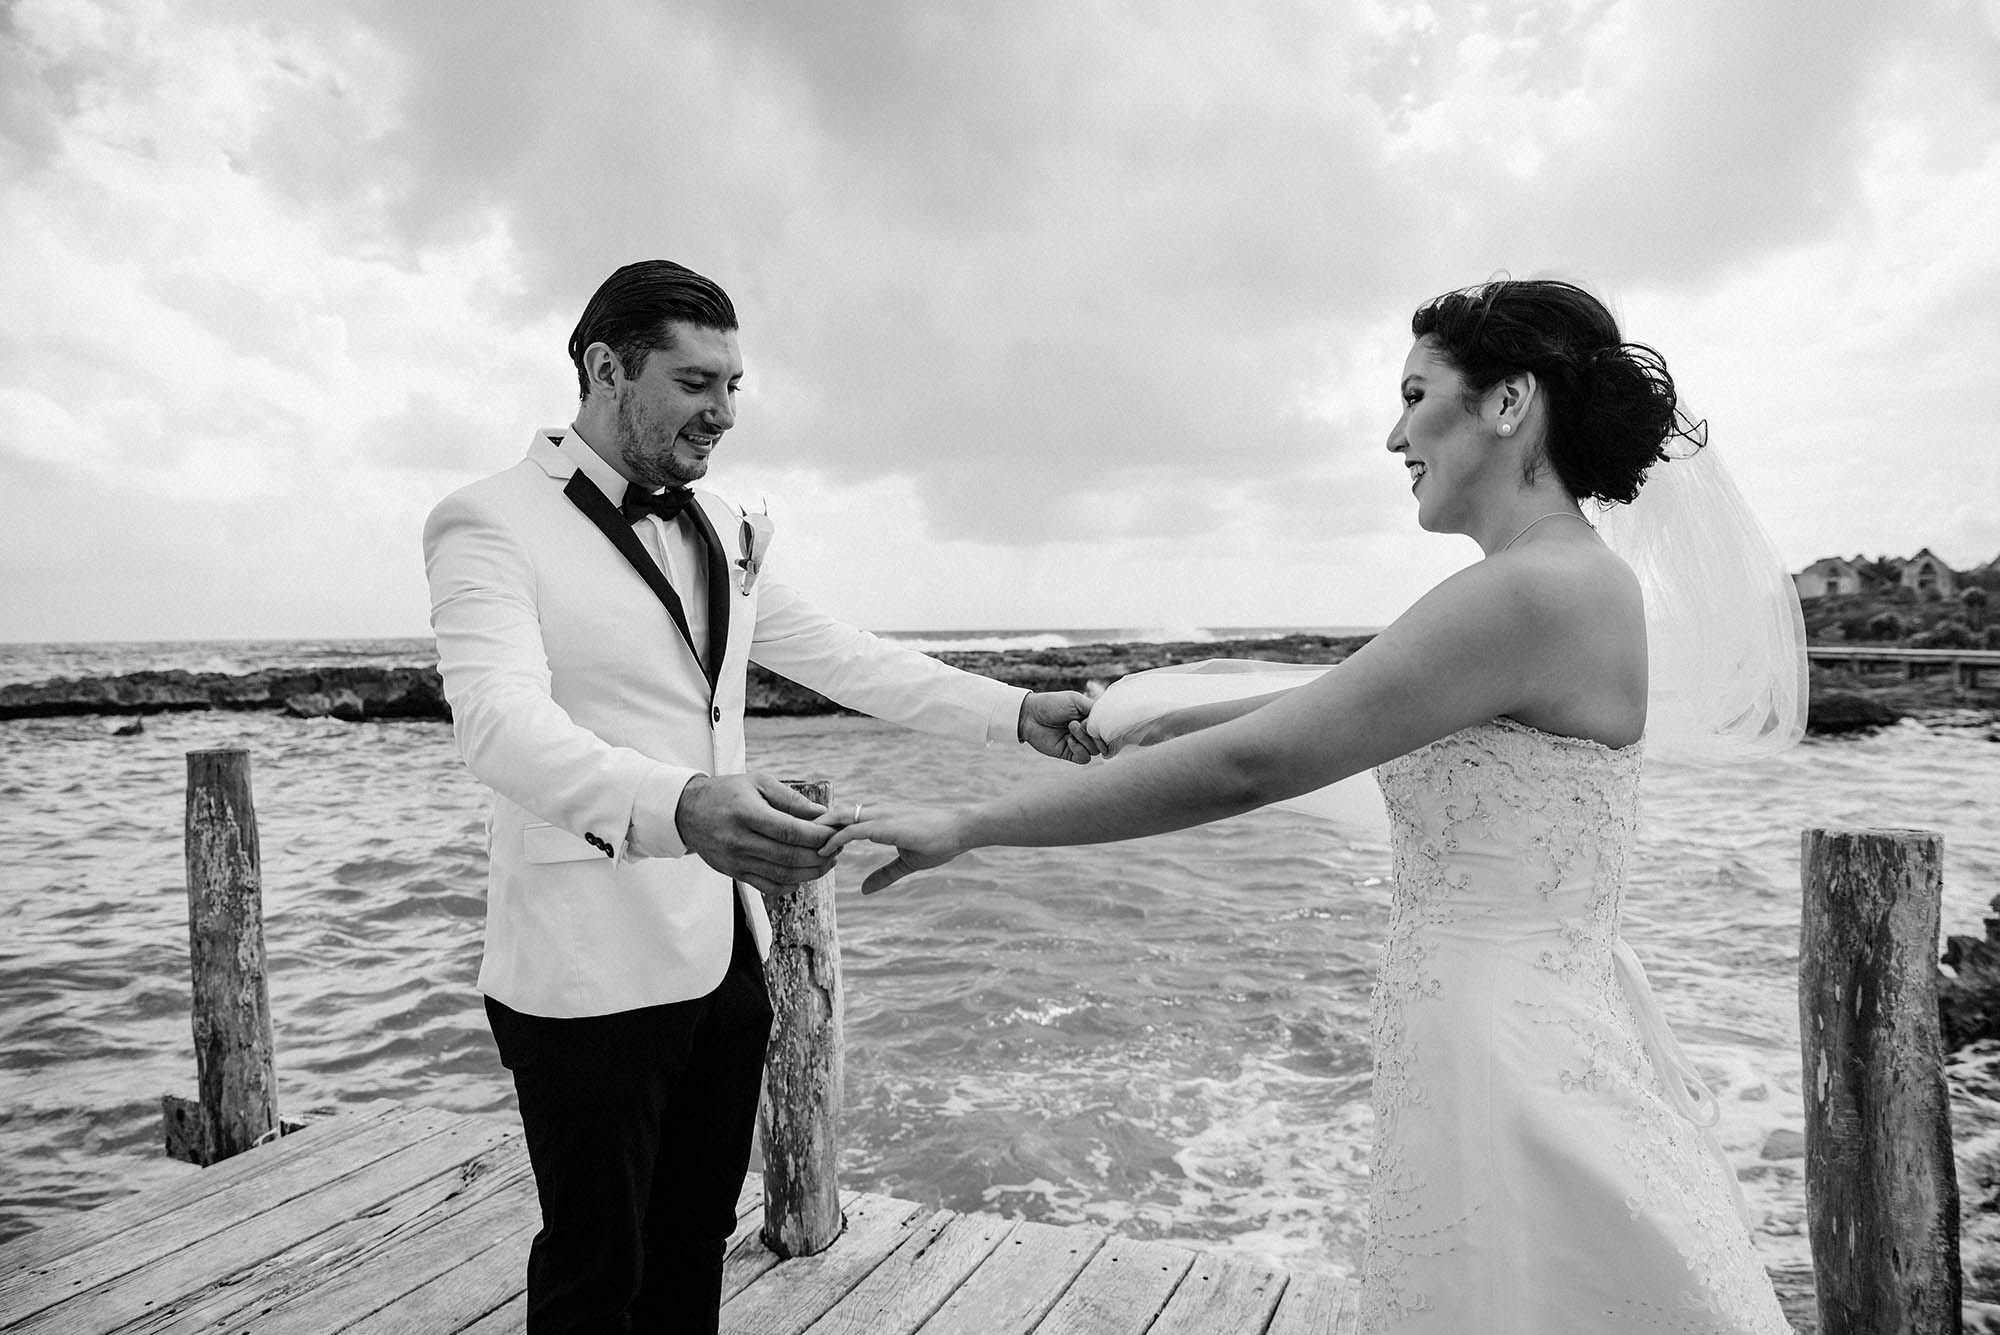 Wedding playa del carmen planner destination mexico magali espinosa22-WEB.jpg